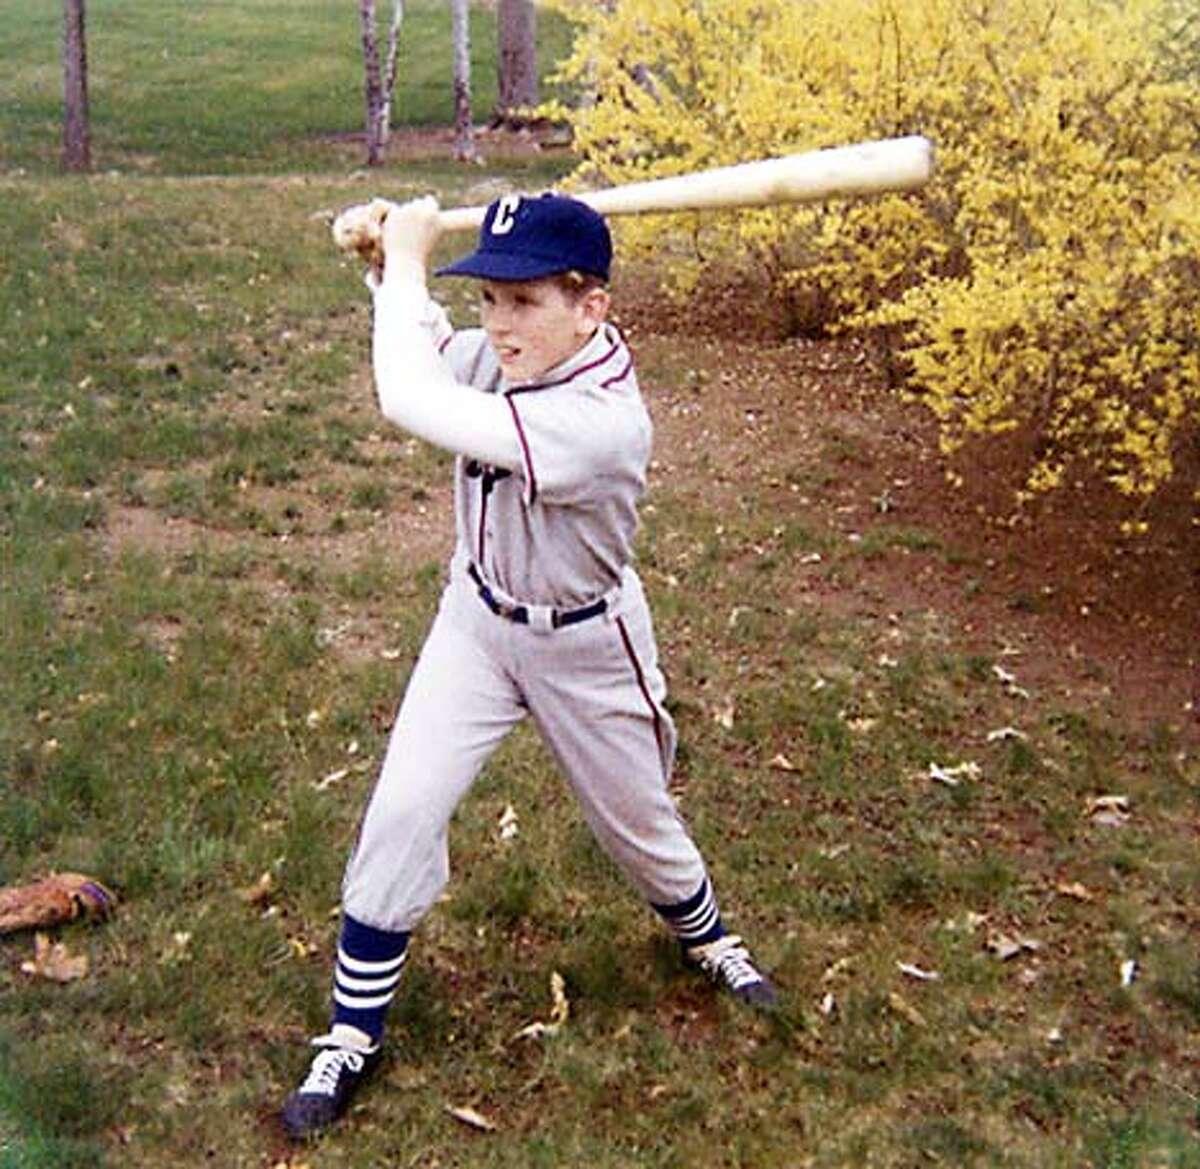 1965: Frank Bennett at age 10, practicing for Little League baseball in New York. Photo courtesy of Fran Bennett